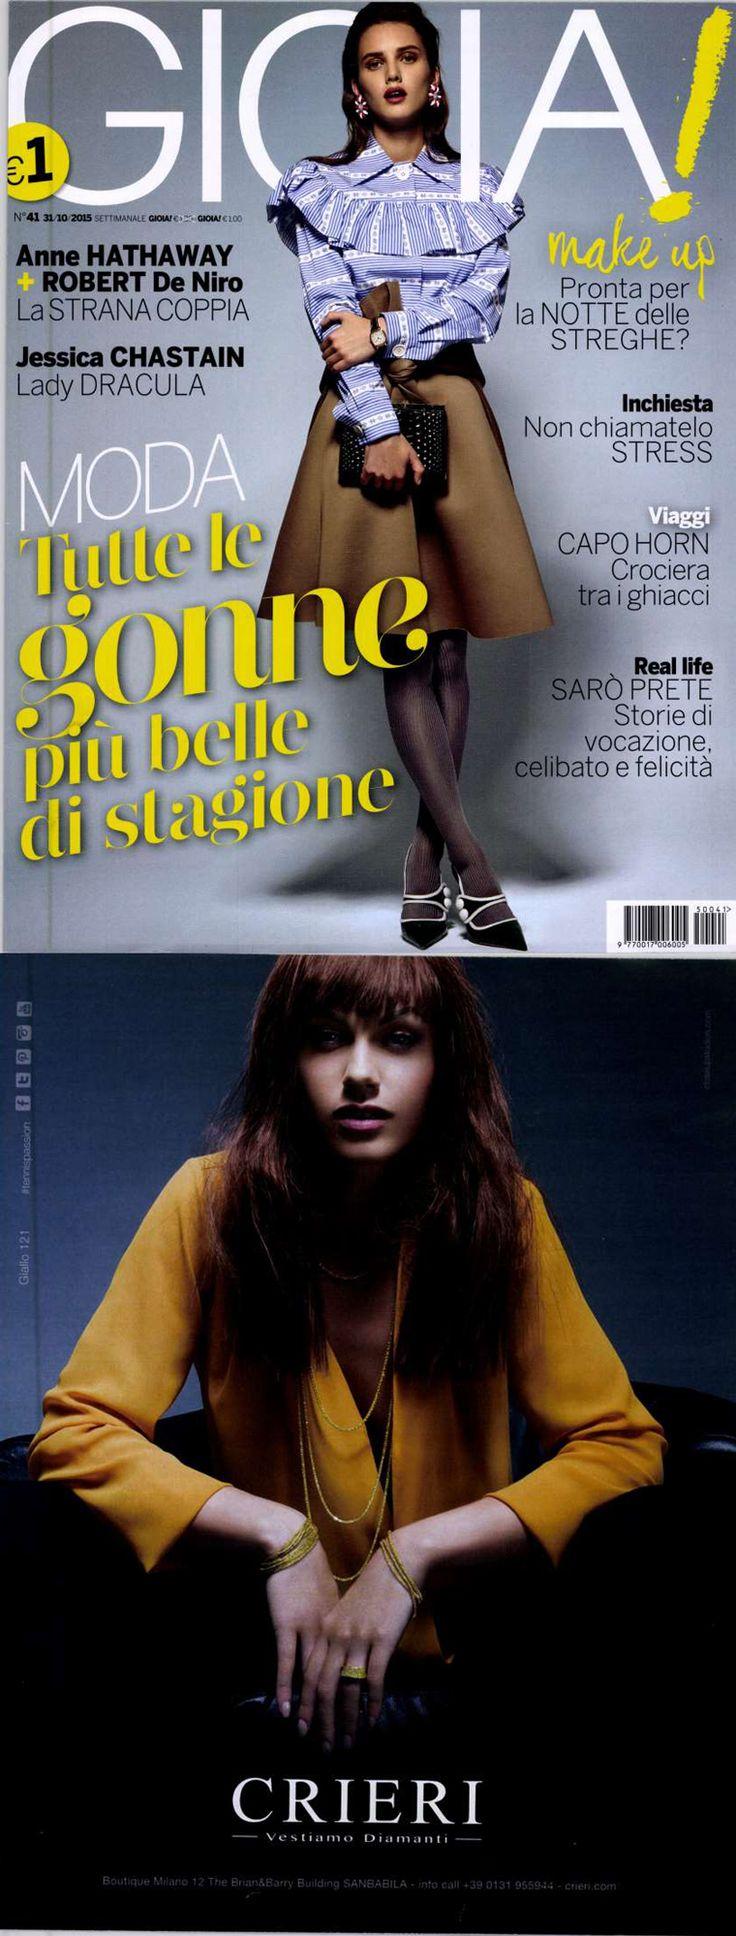 ❖Visto su #GIOIA – 31/10/2015❖ #giallo121 collection #tennis #bracelets #trendy #jewelry #fashion #gold #valenza #crieri #vestiamodiamanti #tennispassion #tennisclub #glamour #chic #lifestyle